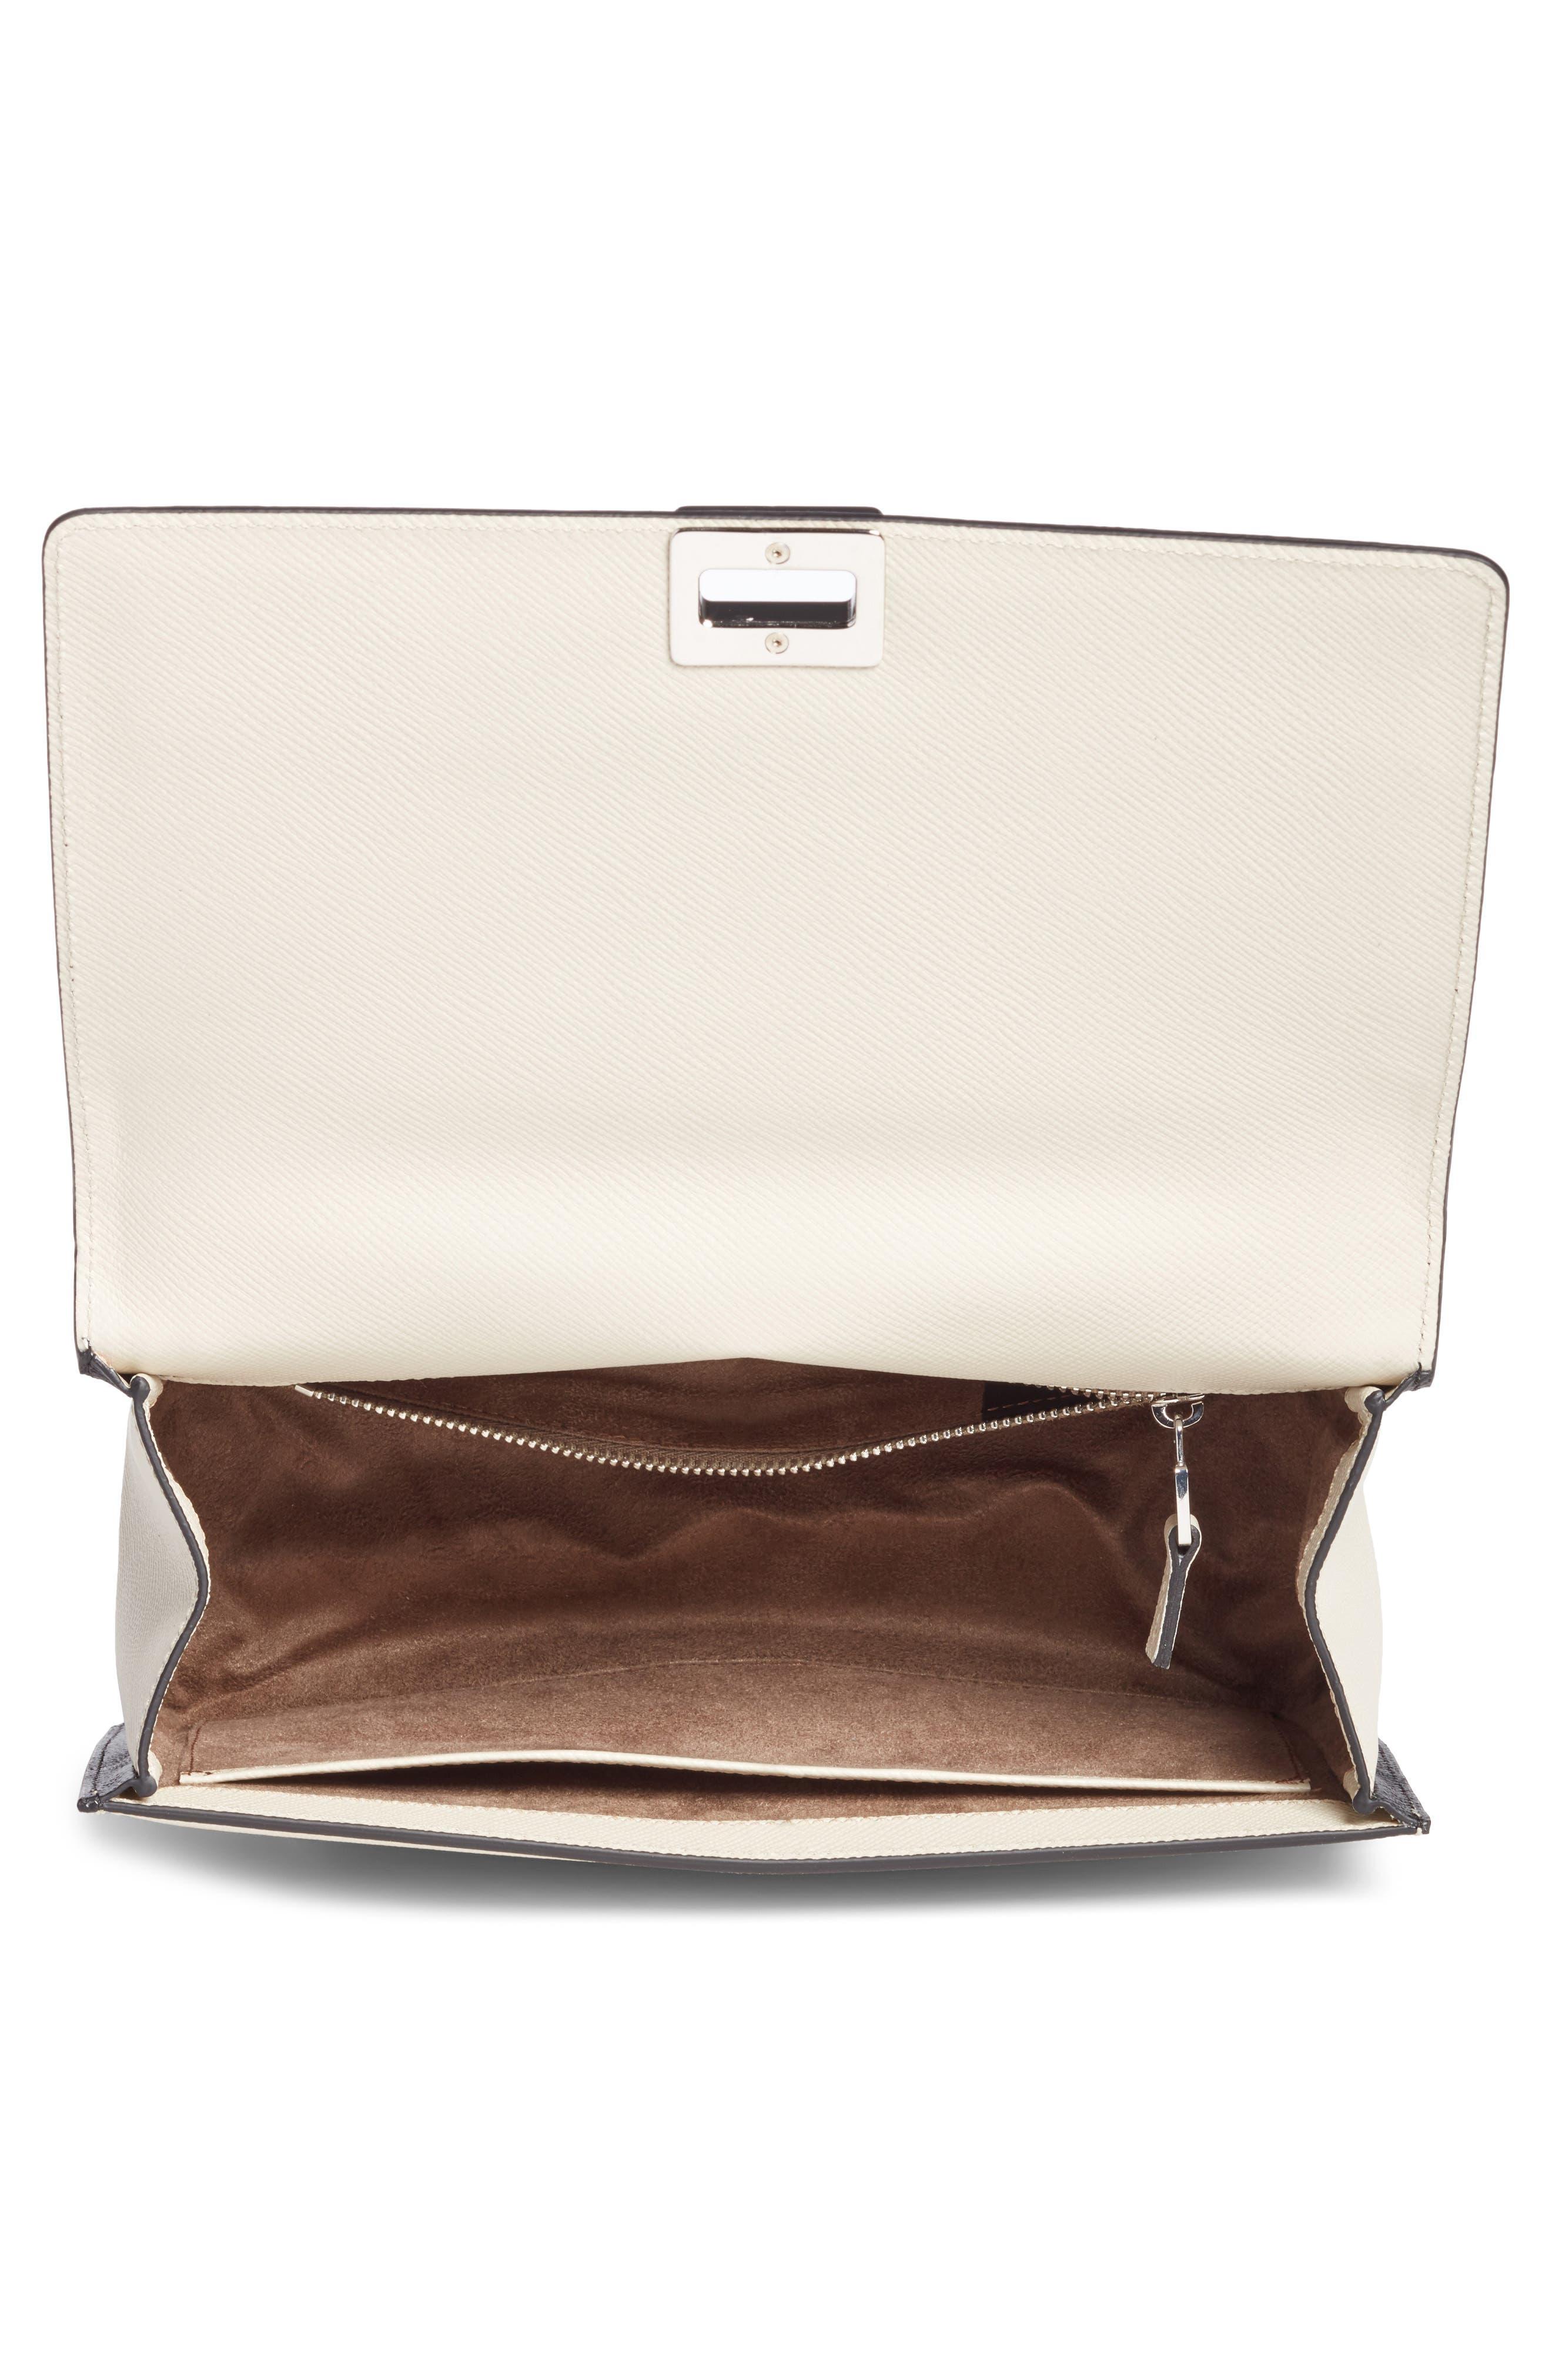 Roberta Evolution Leather Crossbody Bag,                             Alternate thumbnail 4, color,                             110